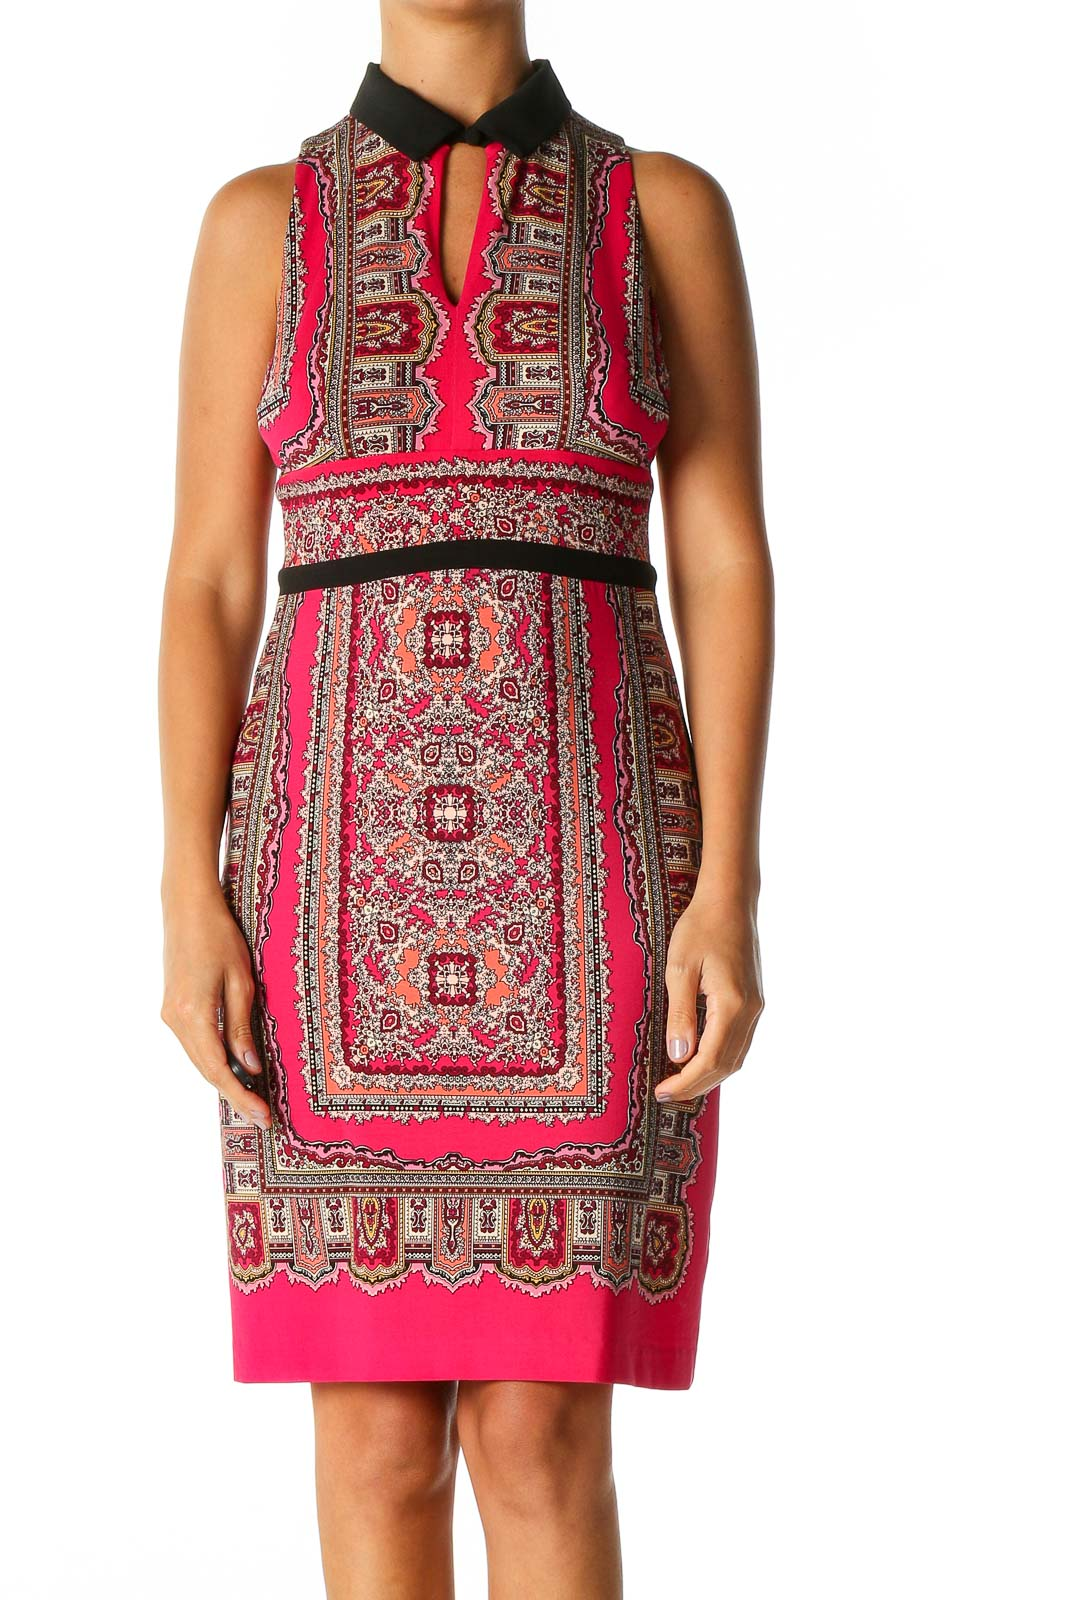 Pink Geometric Print Bohemian Sheath Dress Front